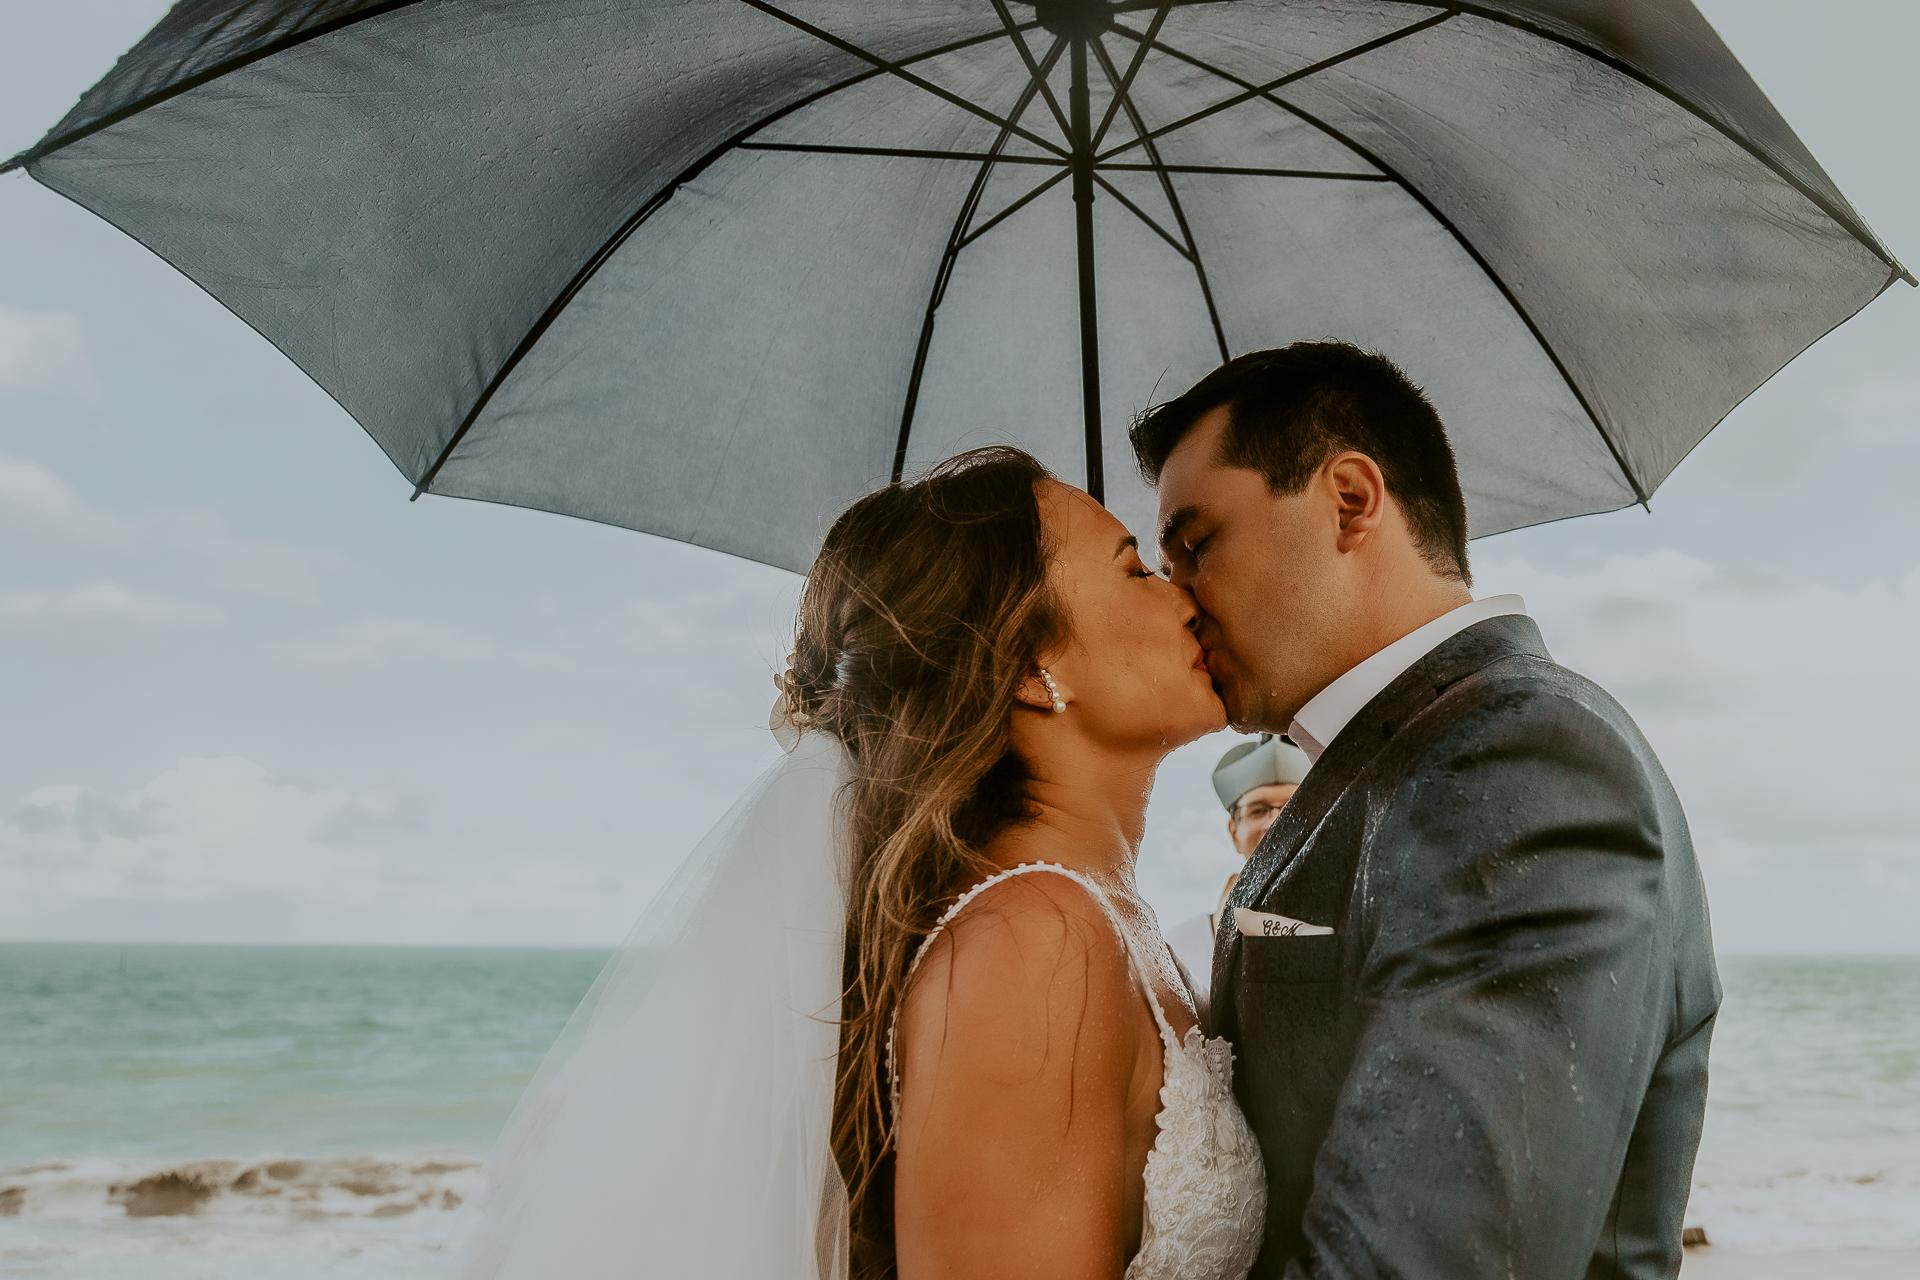 Porto de Pedras beach wedding image | Seeking shelter under an umbrella